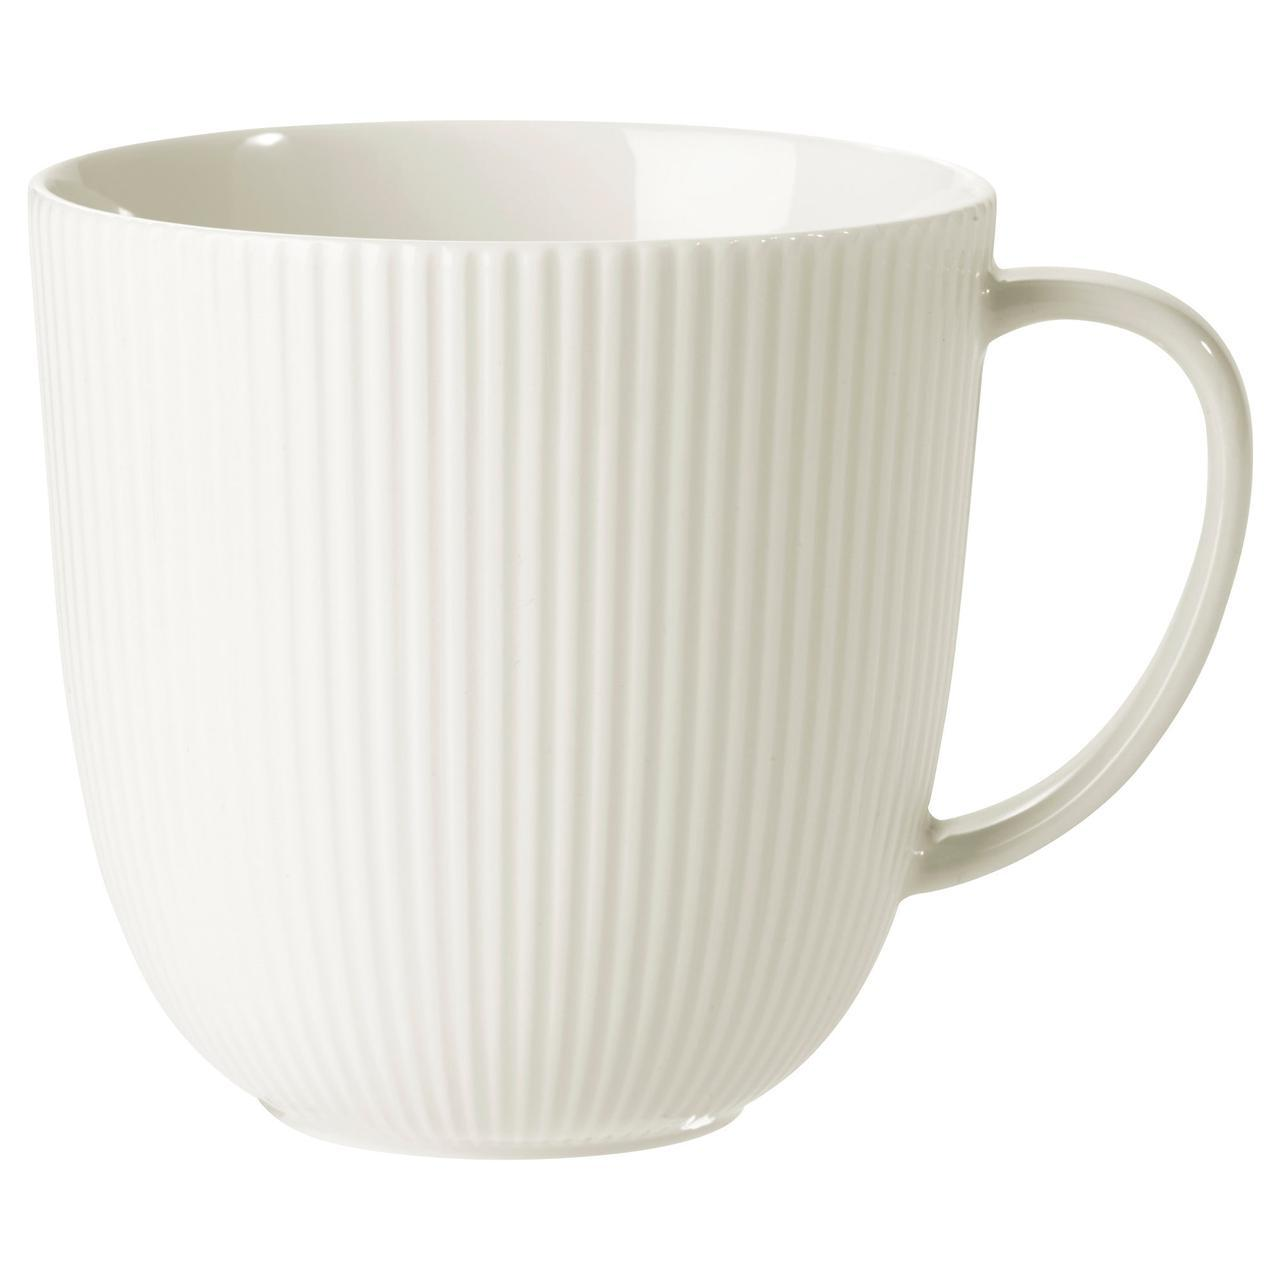 ✅ IKEA OFANTLIGT (003.190.22) Кружка, белая